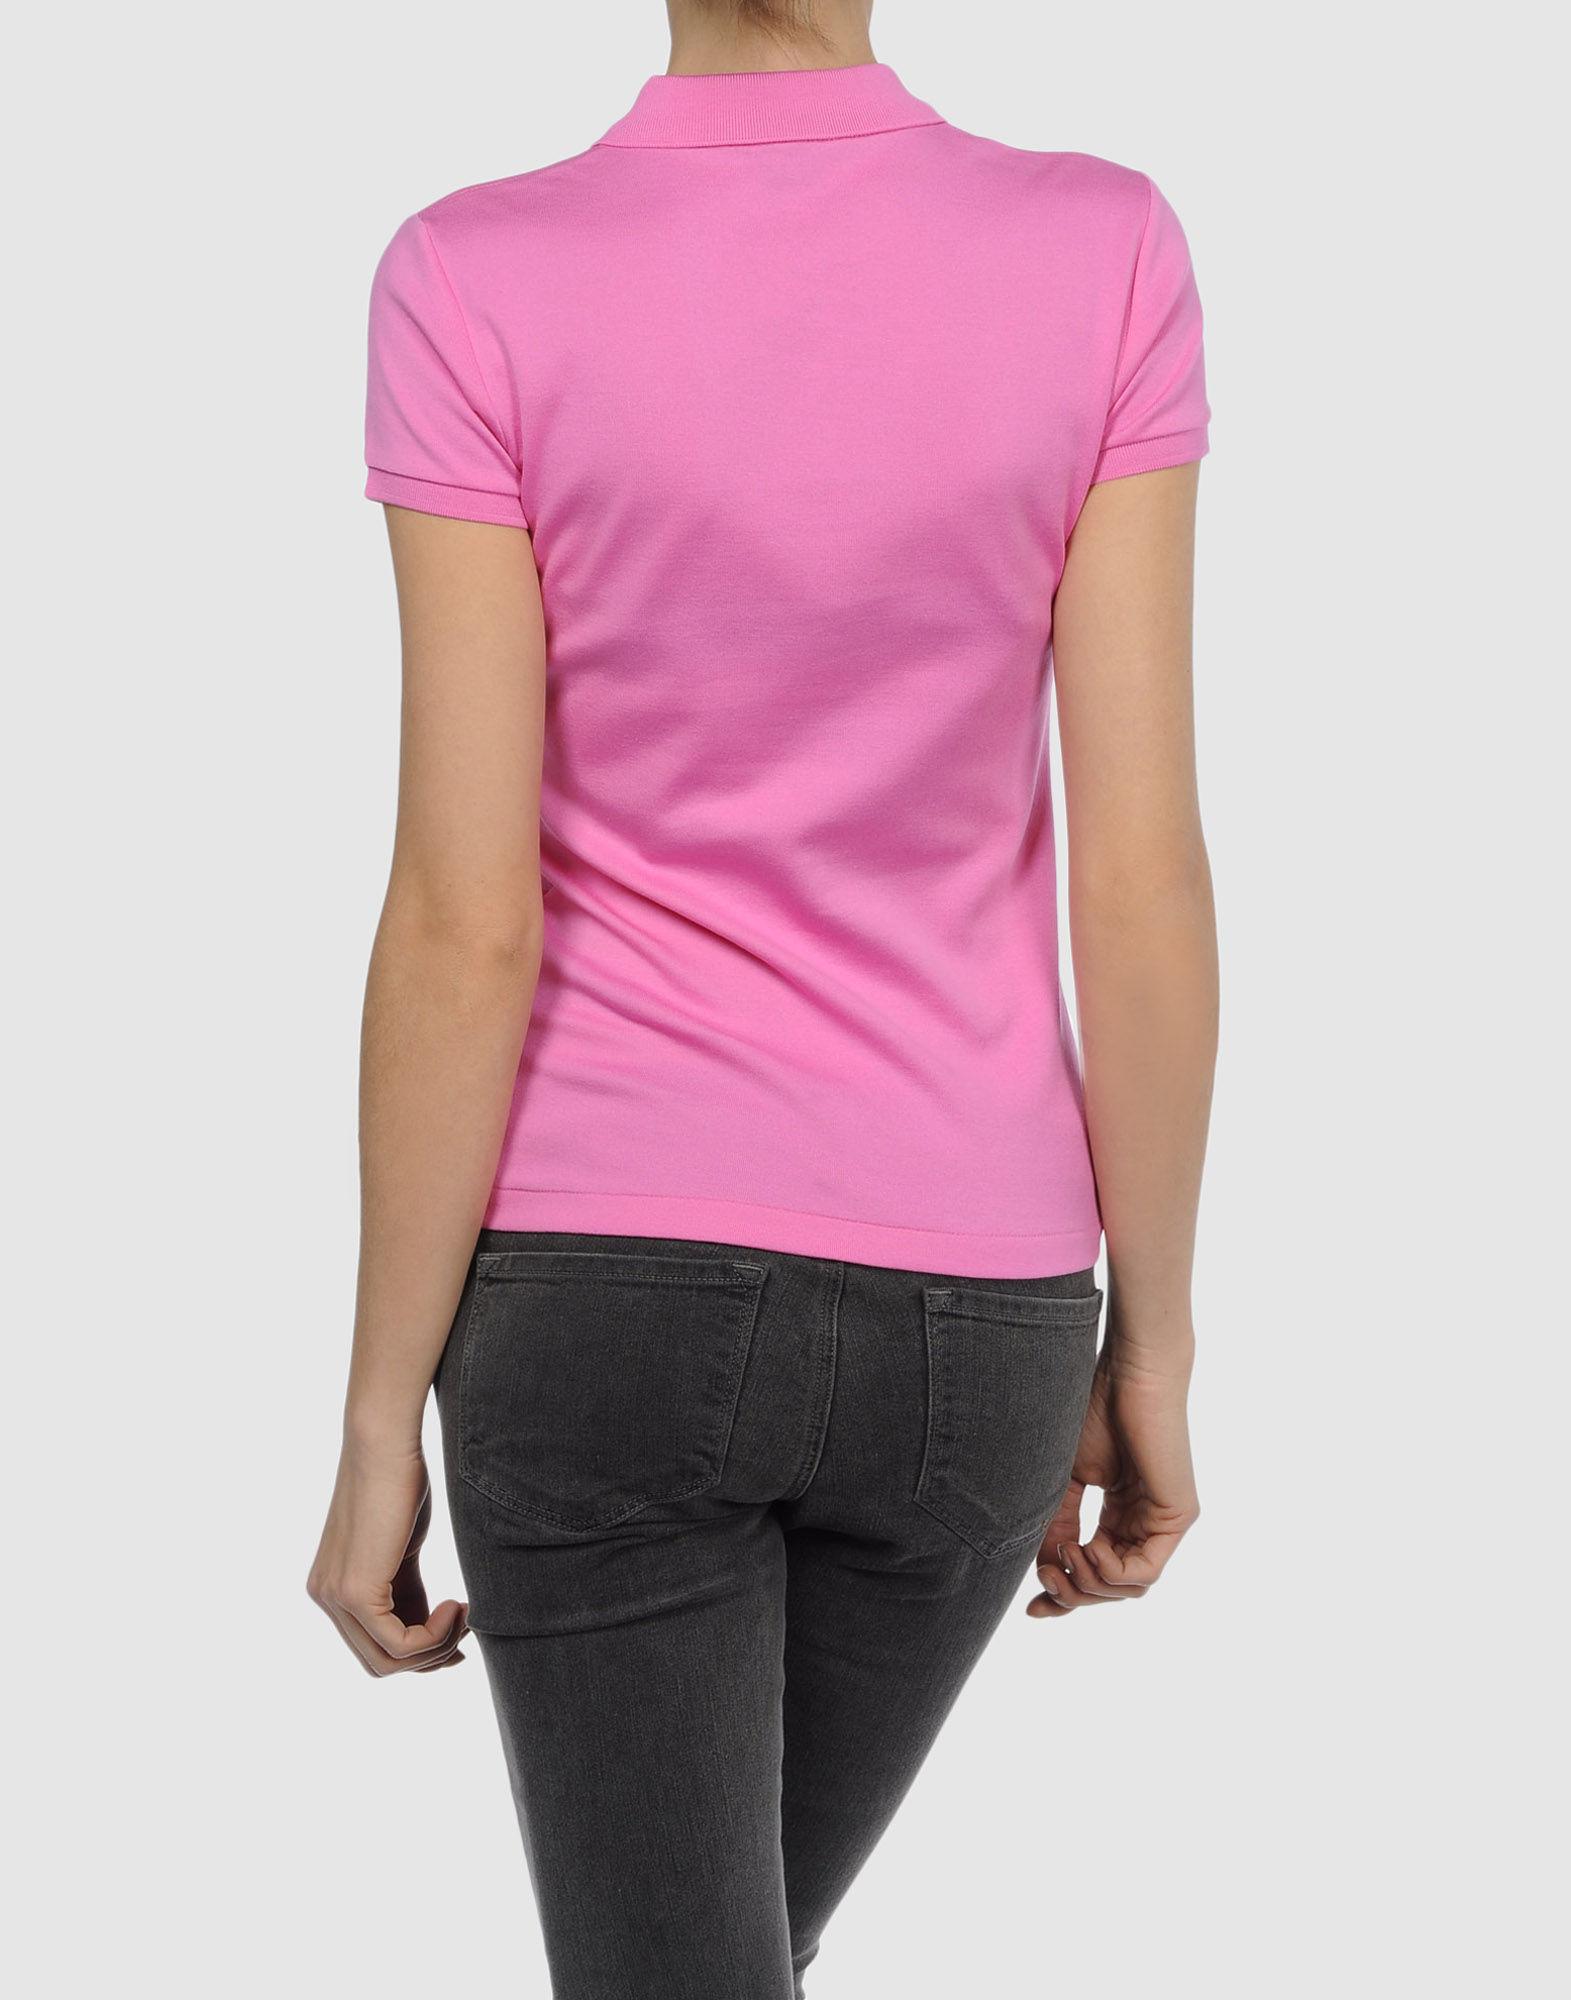 Ralph lauren black label polo shirt in pink lyst for Ralph lauren black label polo shirt